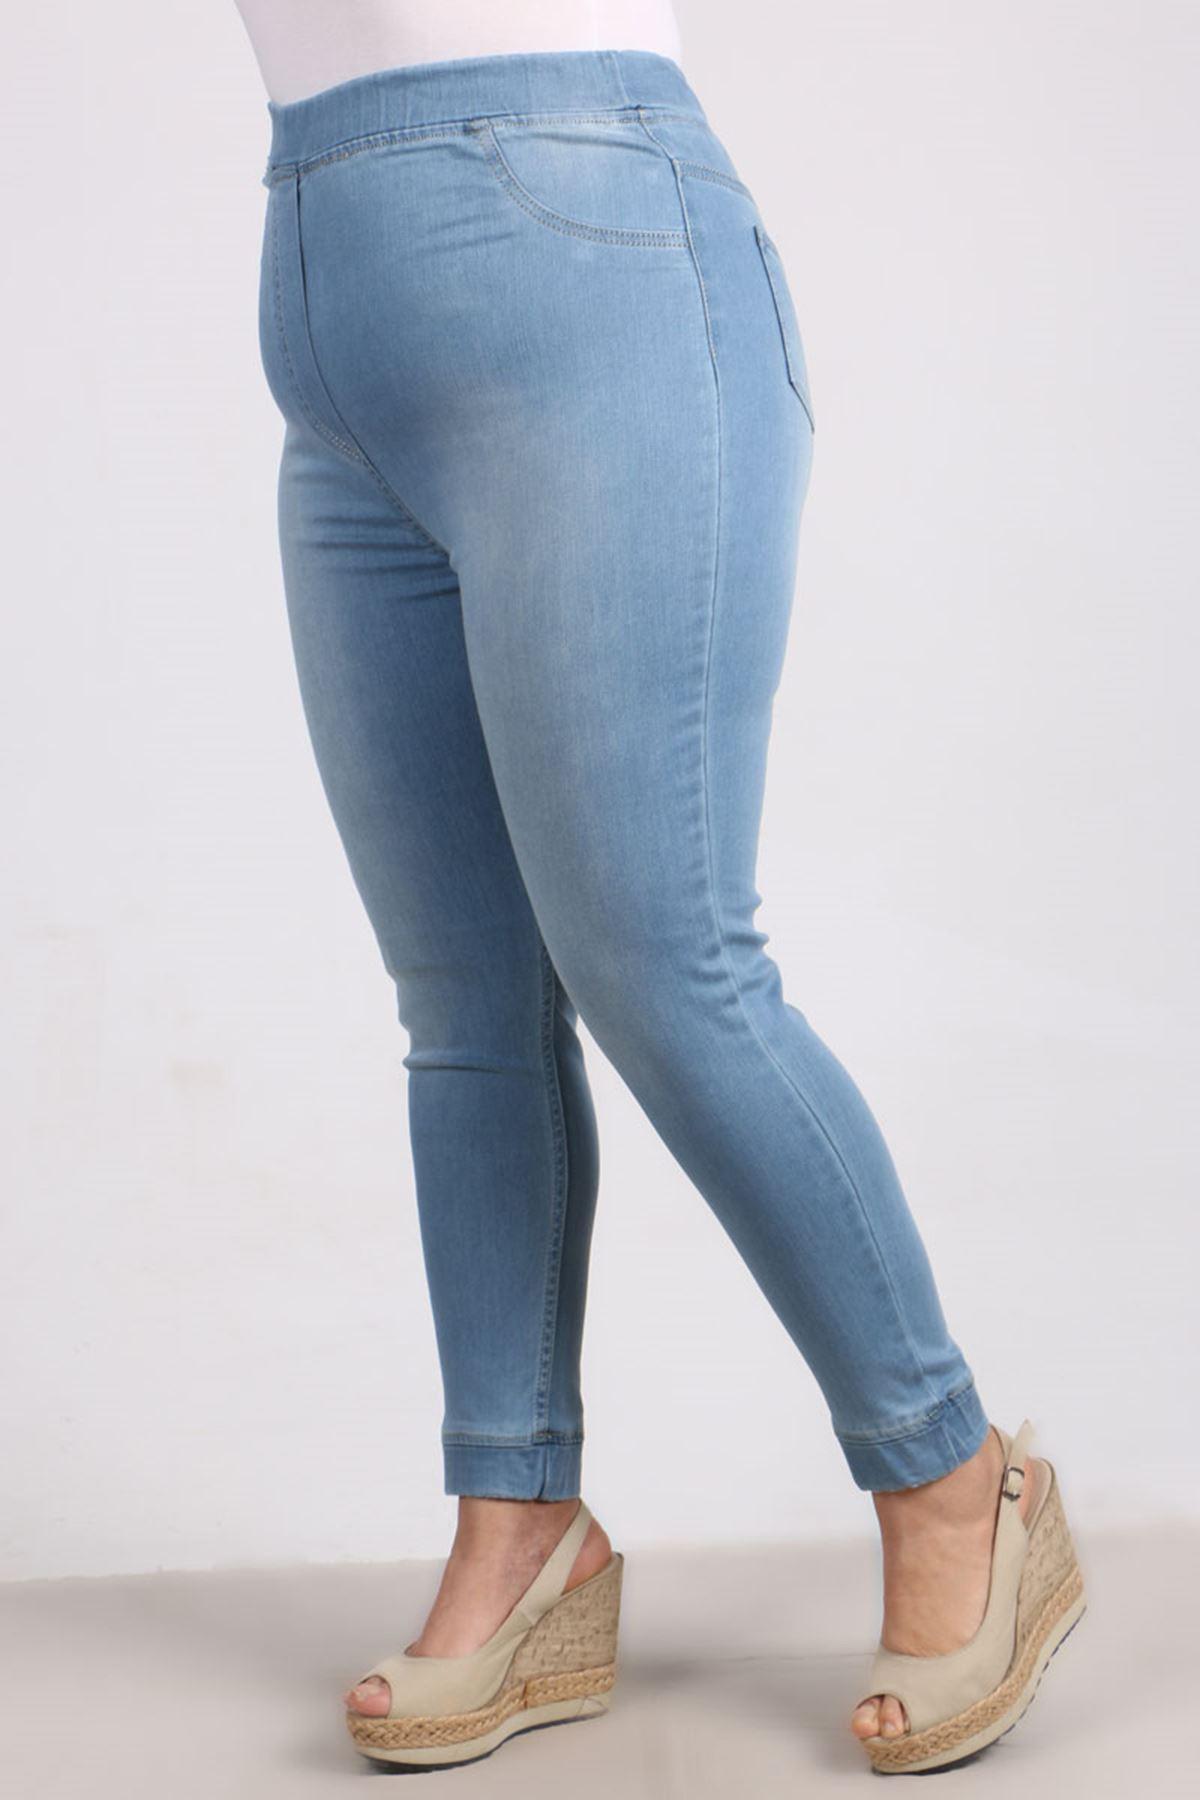 9139-1 Plus Size Elastic Waist Skinny Leg Jeans-Ice Blue